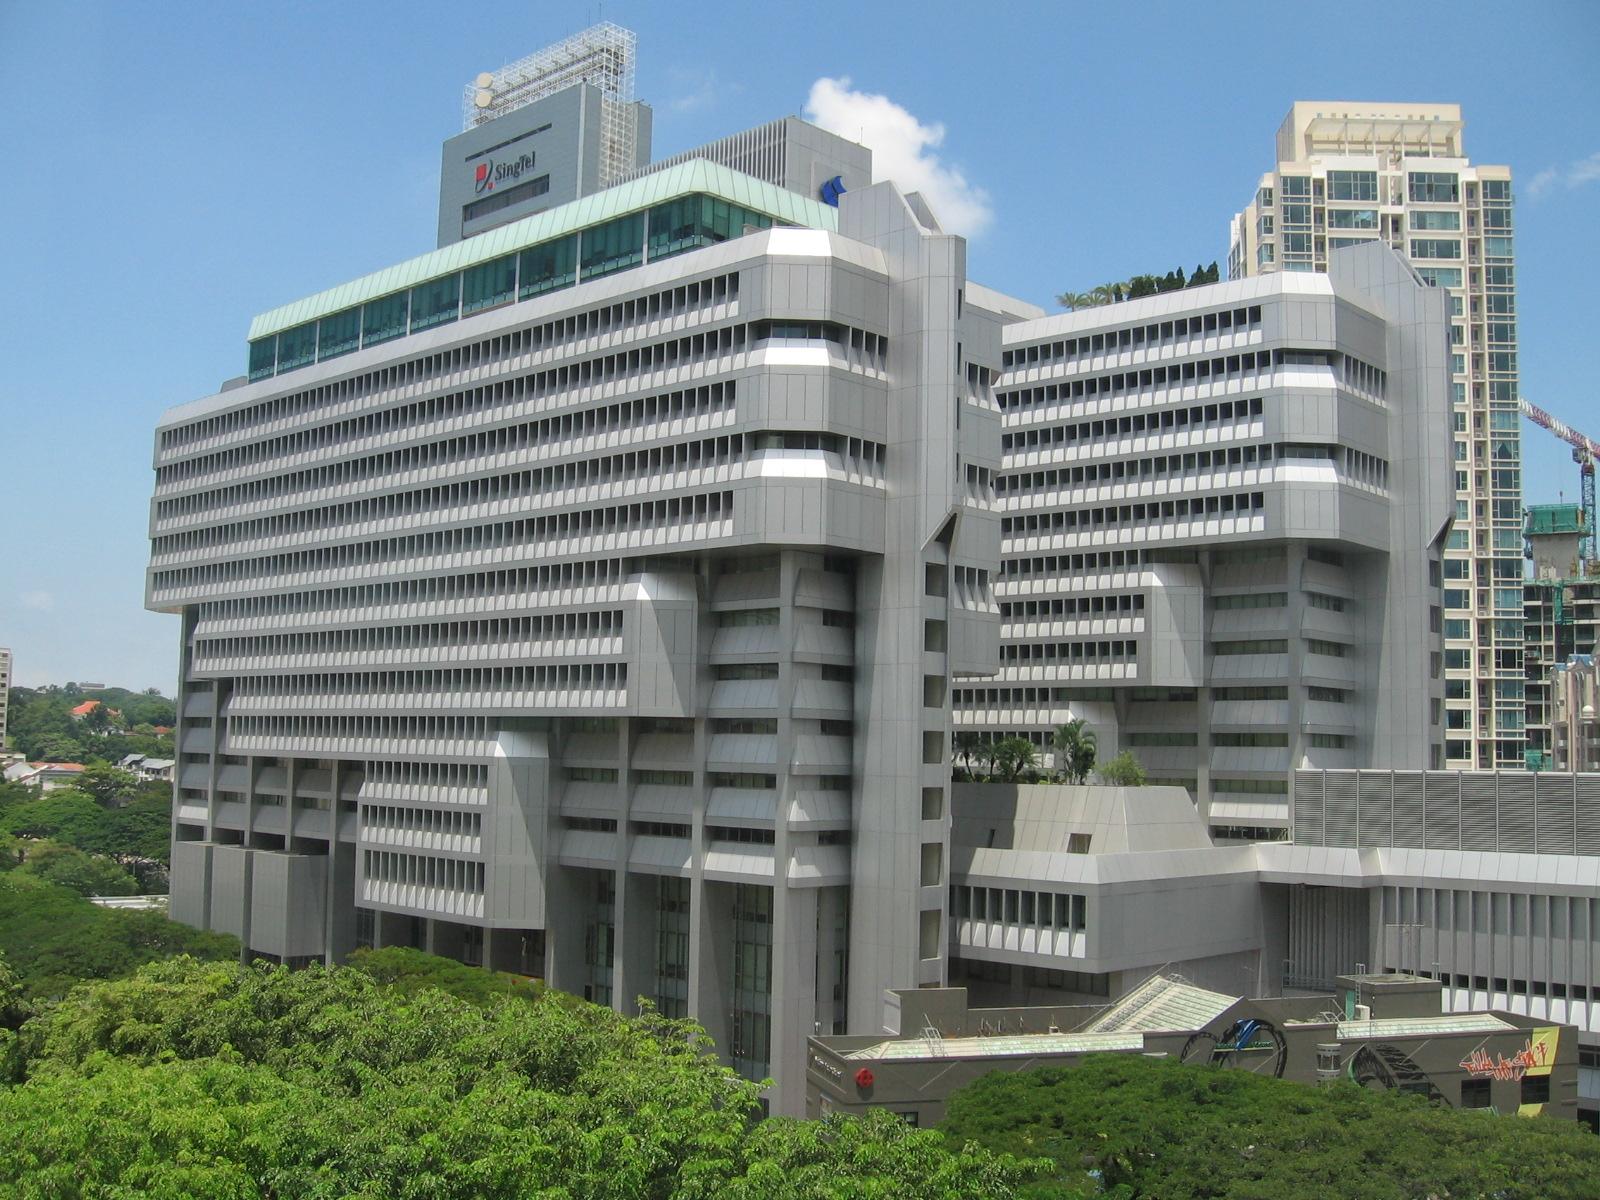 Singapore S Hidden Architectural Gems